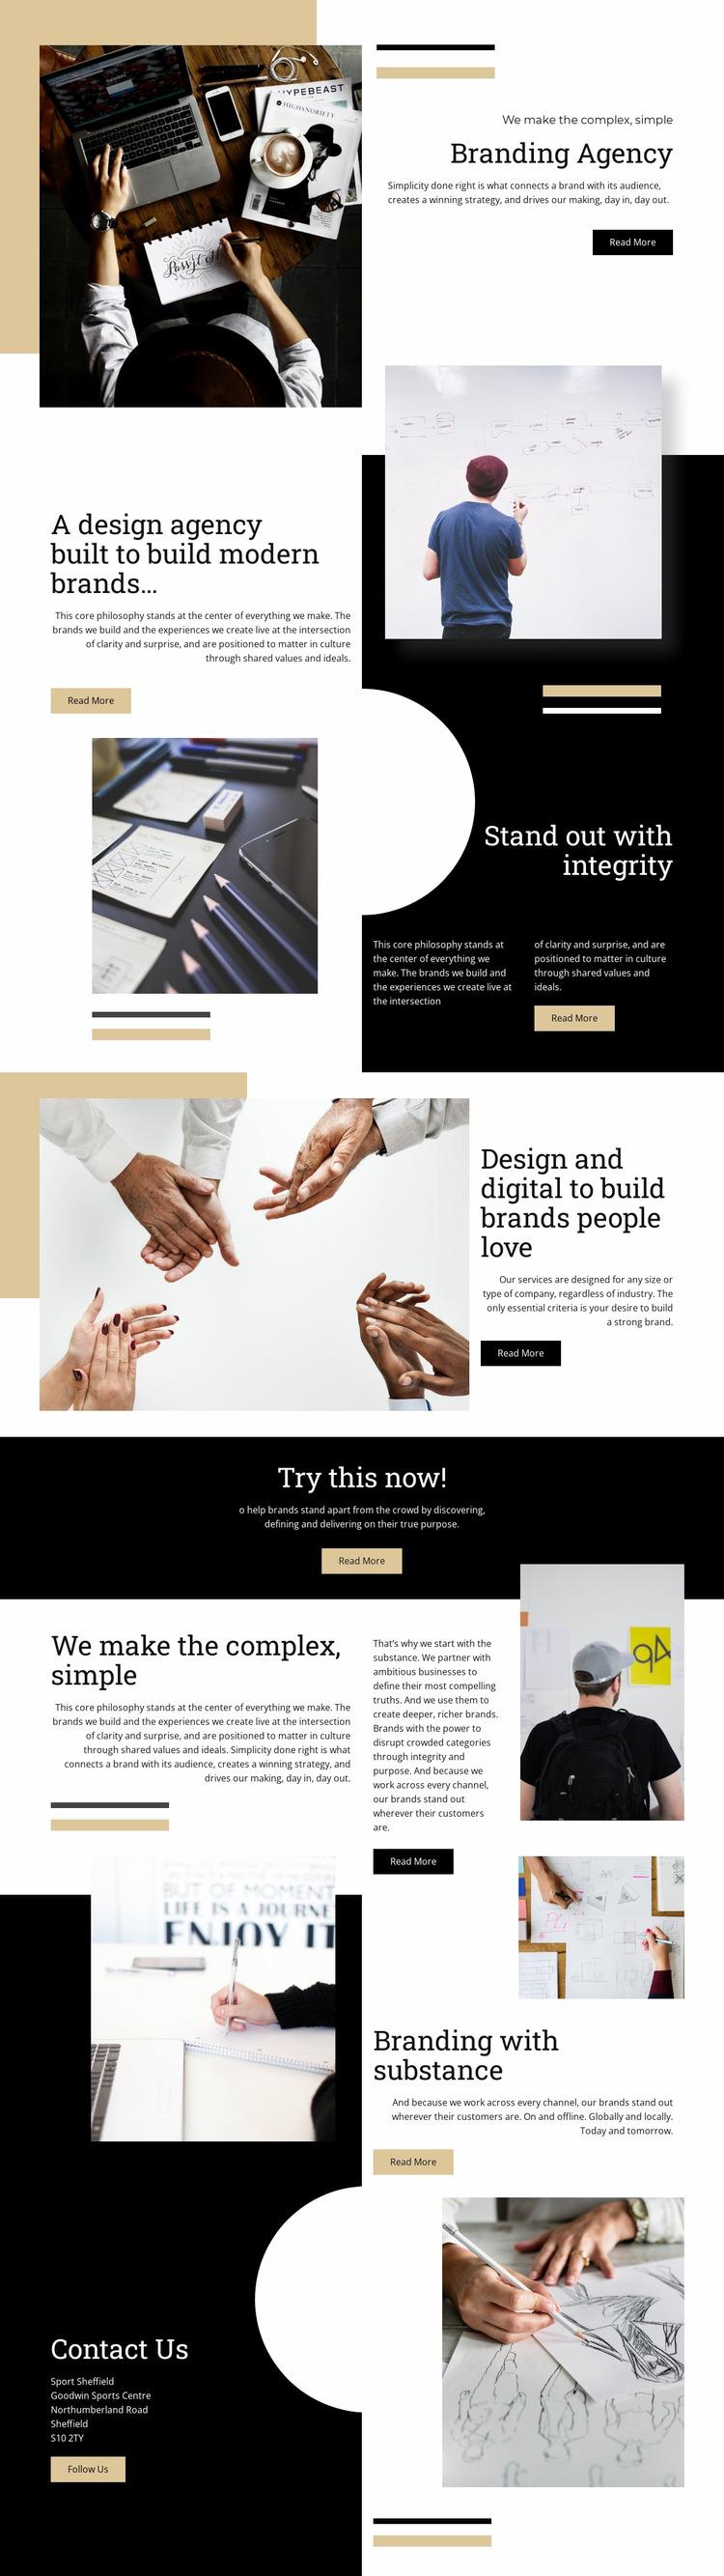 Branding Agency WordPress Website Builder